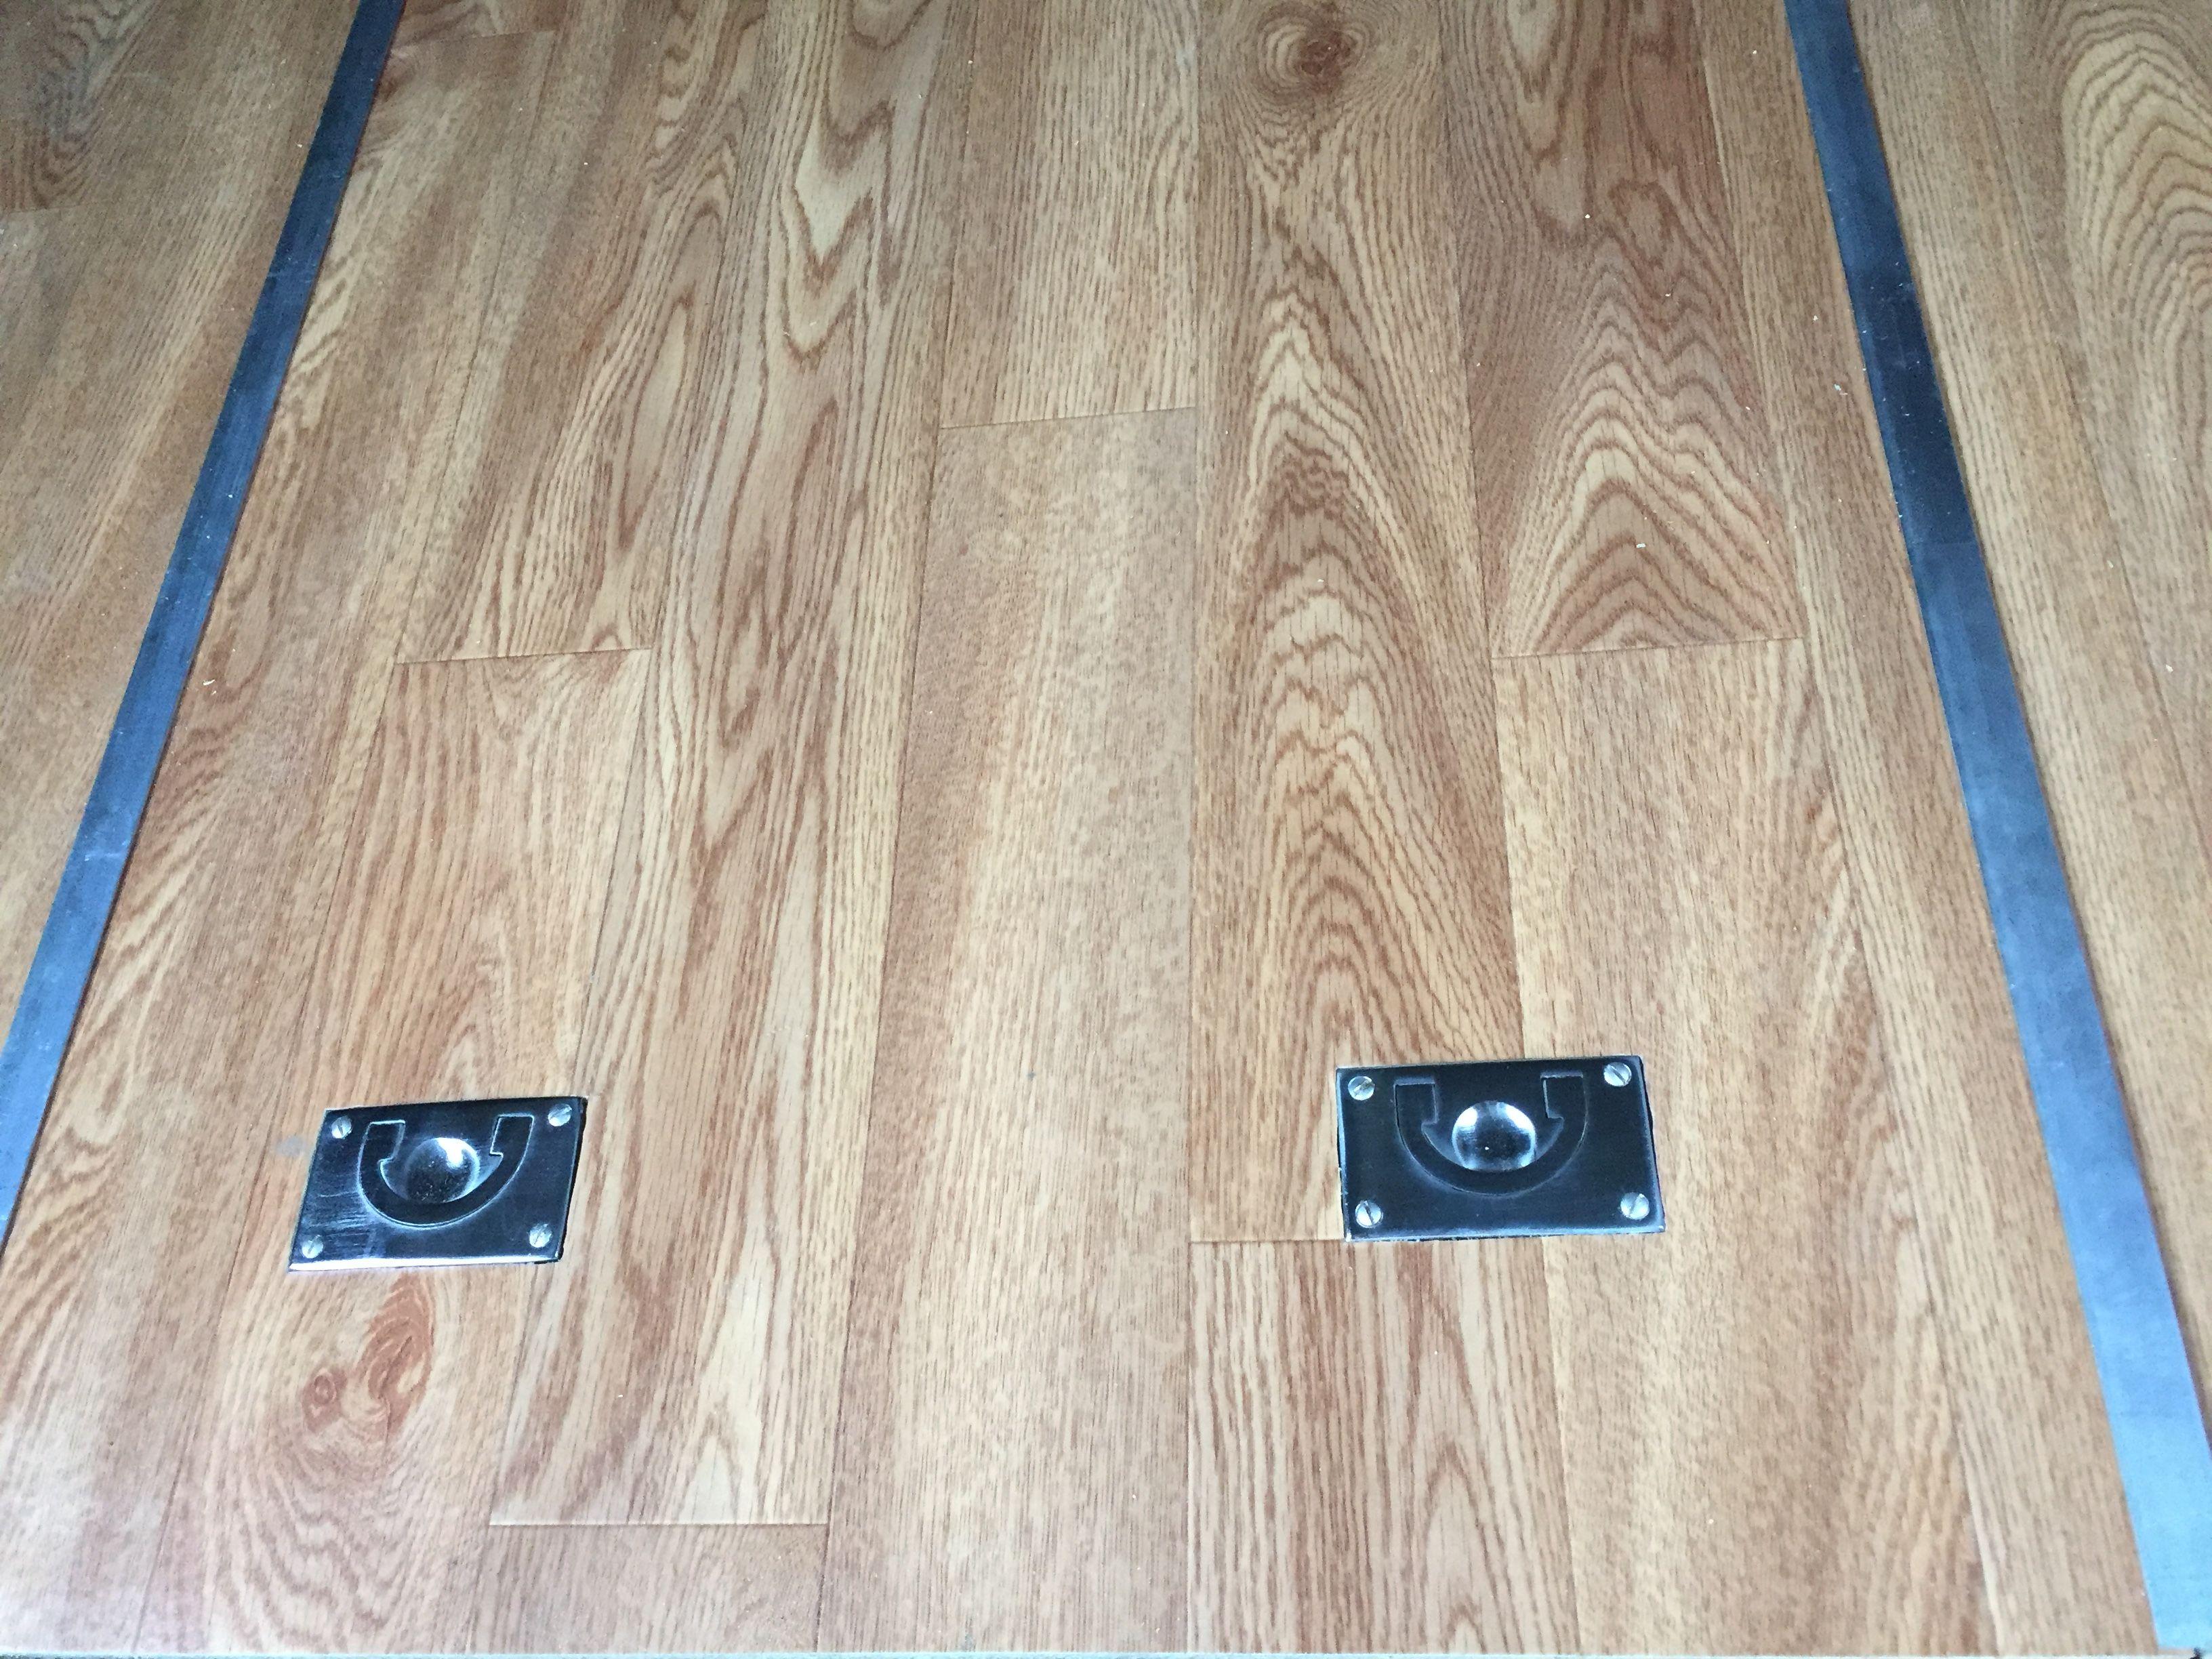 Central Floor Hatch Installed In The Rv Aluminium Trim And Marine Handles Flush With The Floor School Bus Winnebago Camper Van